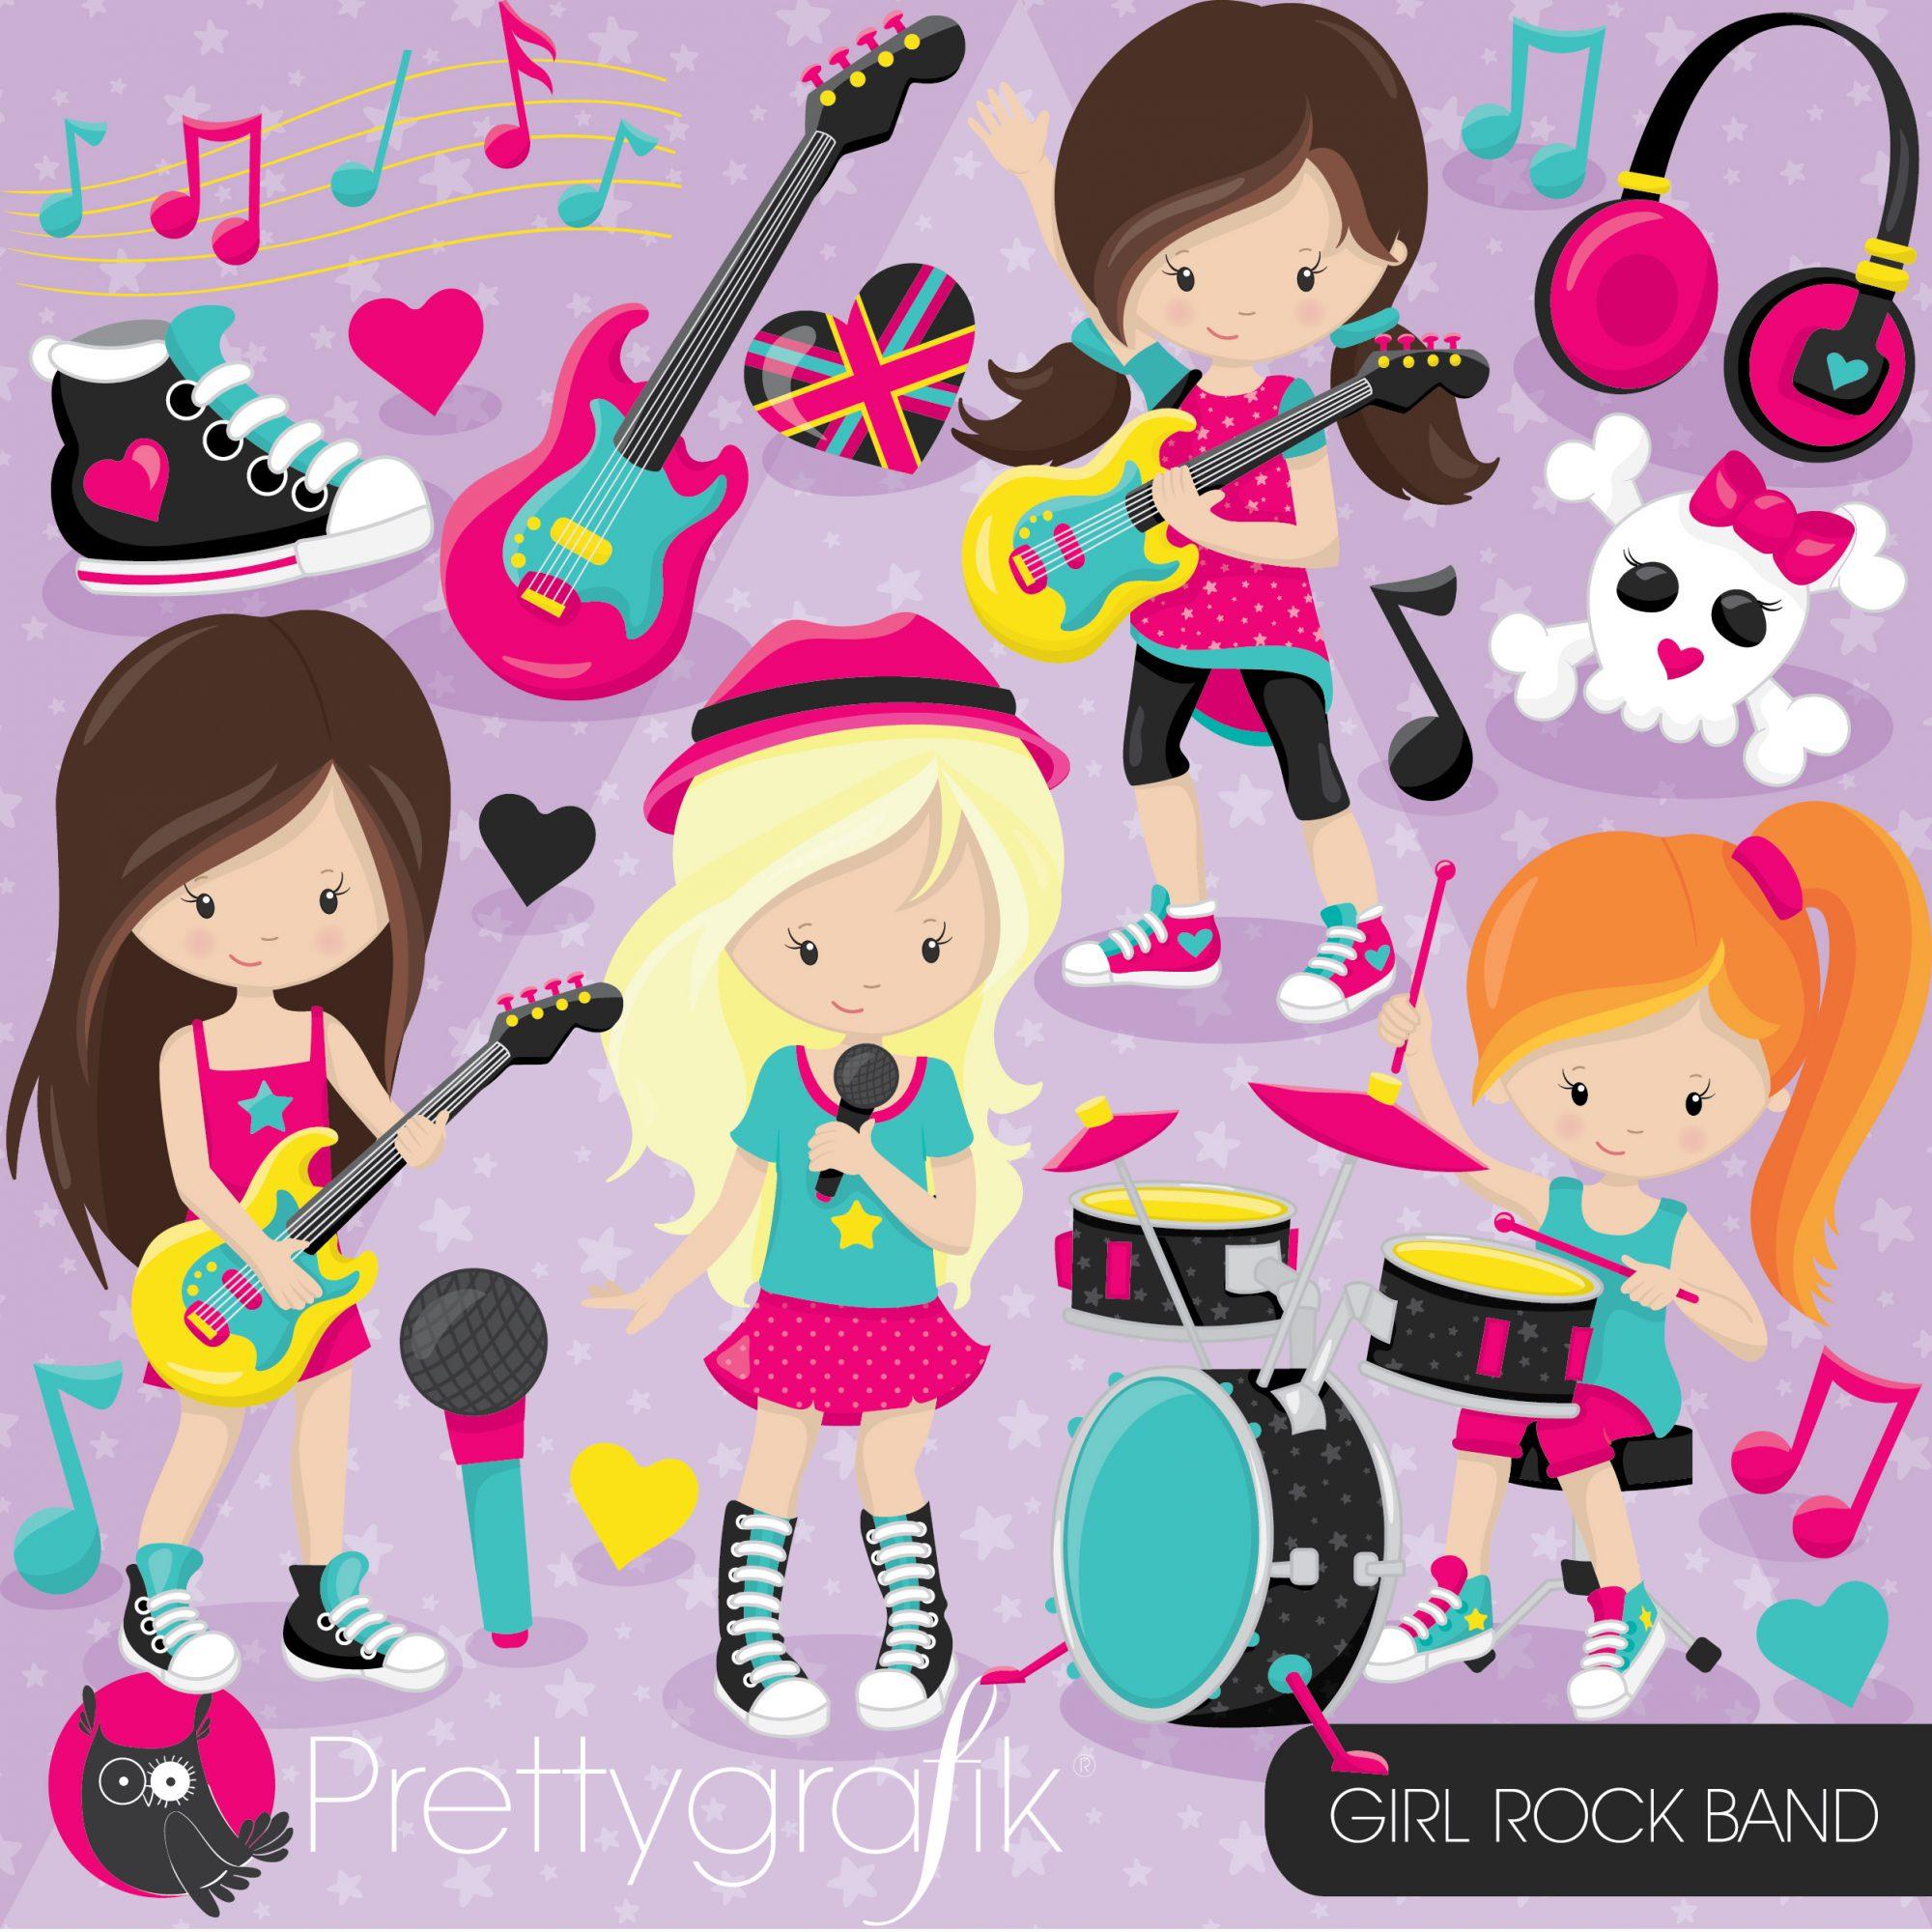 Girl prettygrafik store. Band clipart rock band